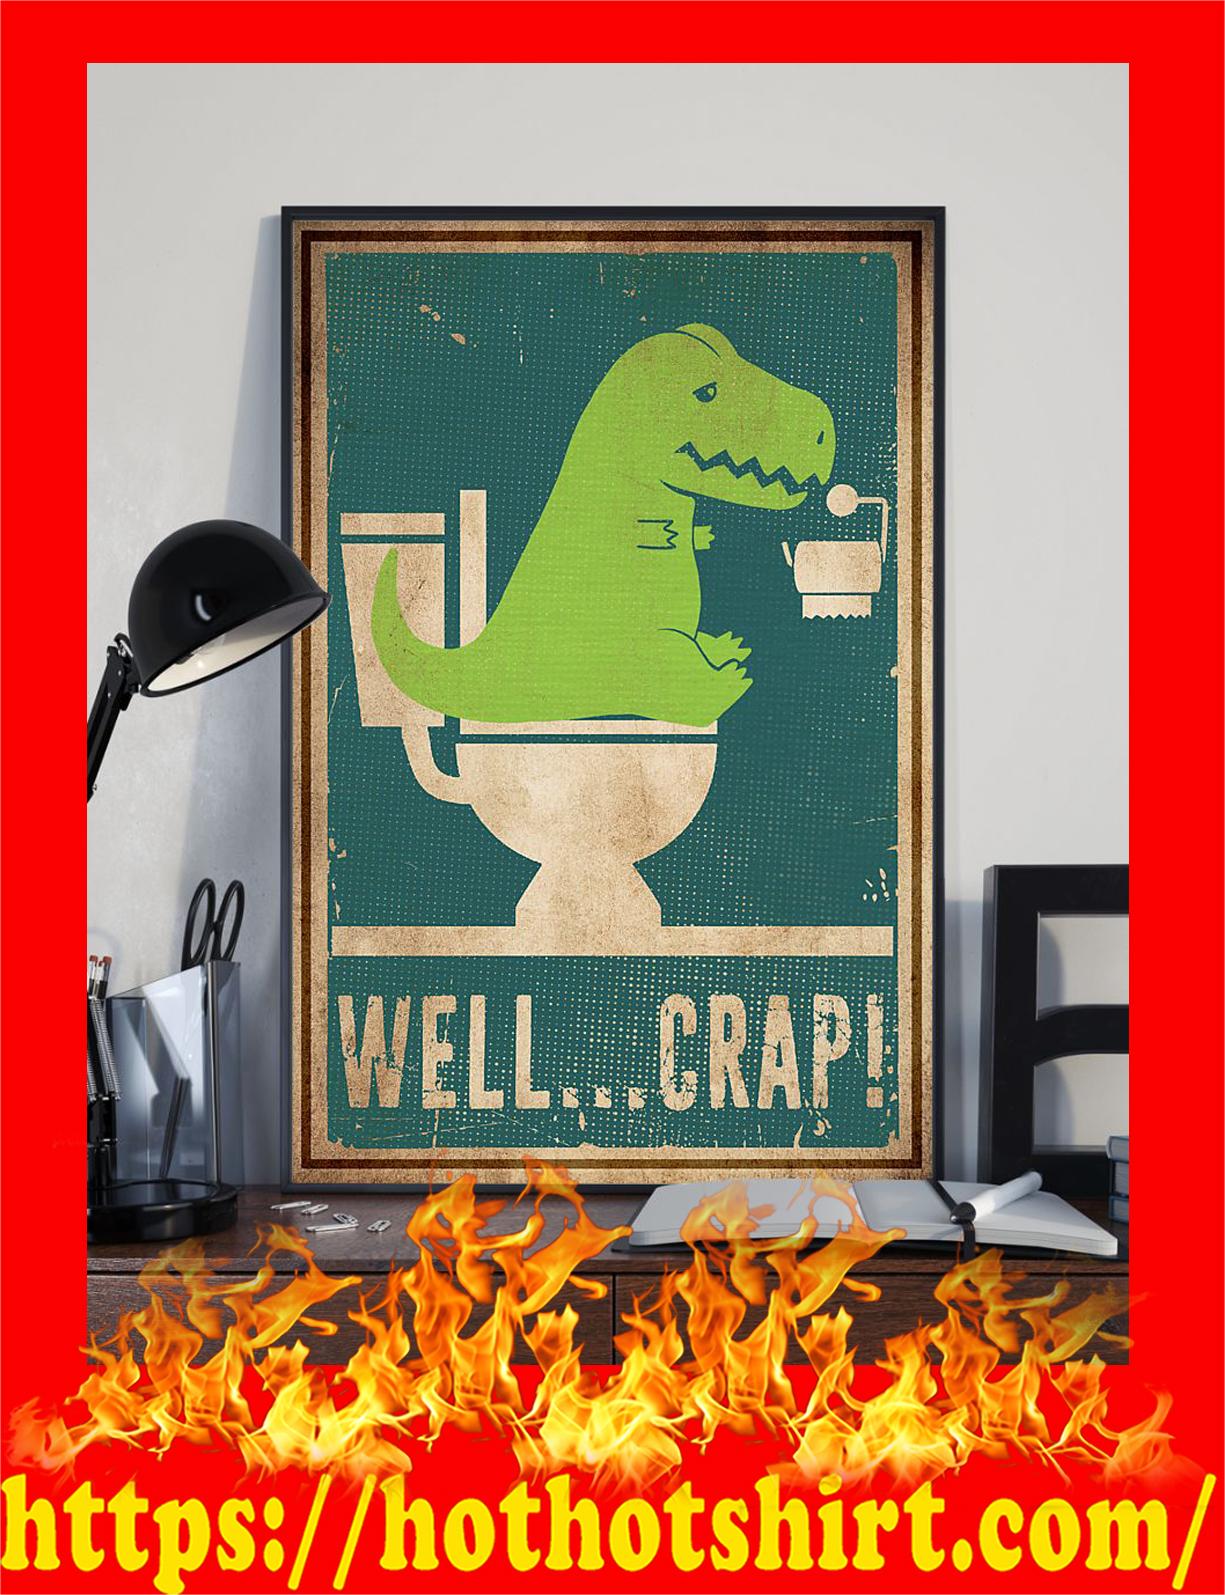 Well crap dinosaur t-rex poster - pic 2